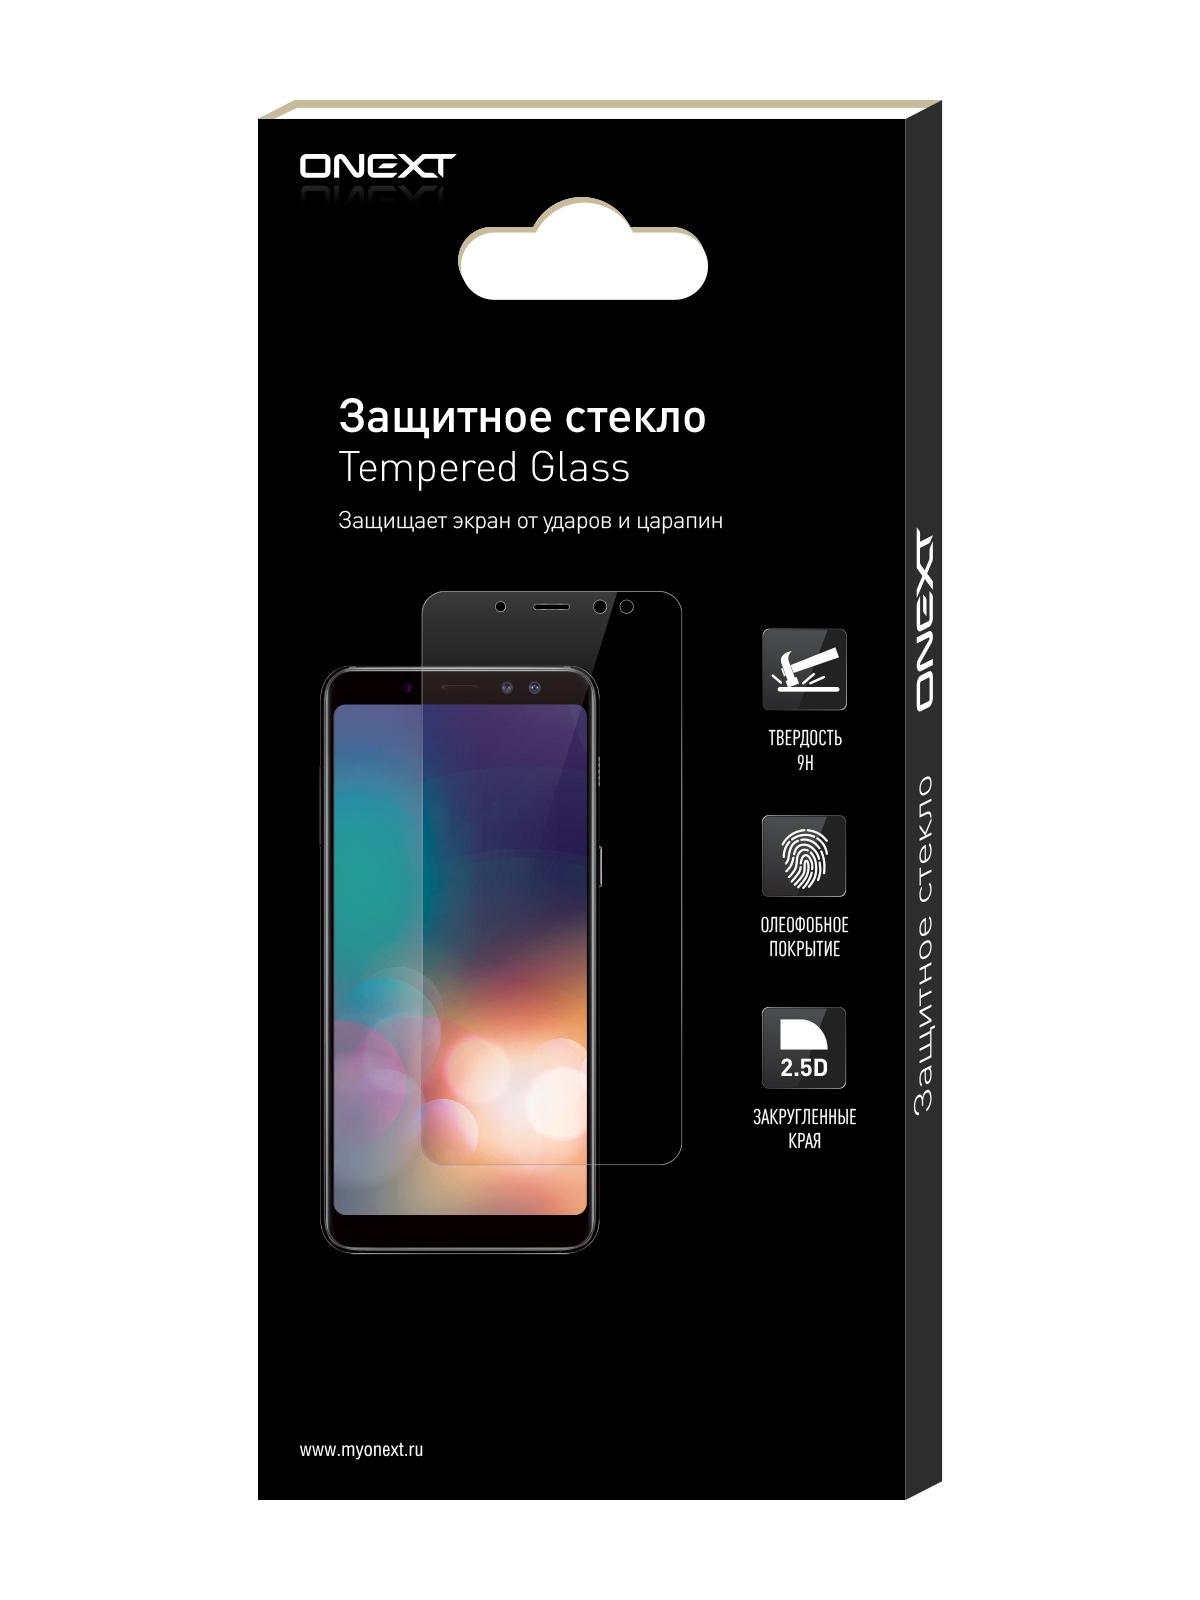 Защитное стекло ONEXT для Sony Xperia C5 Ultra